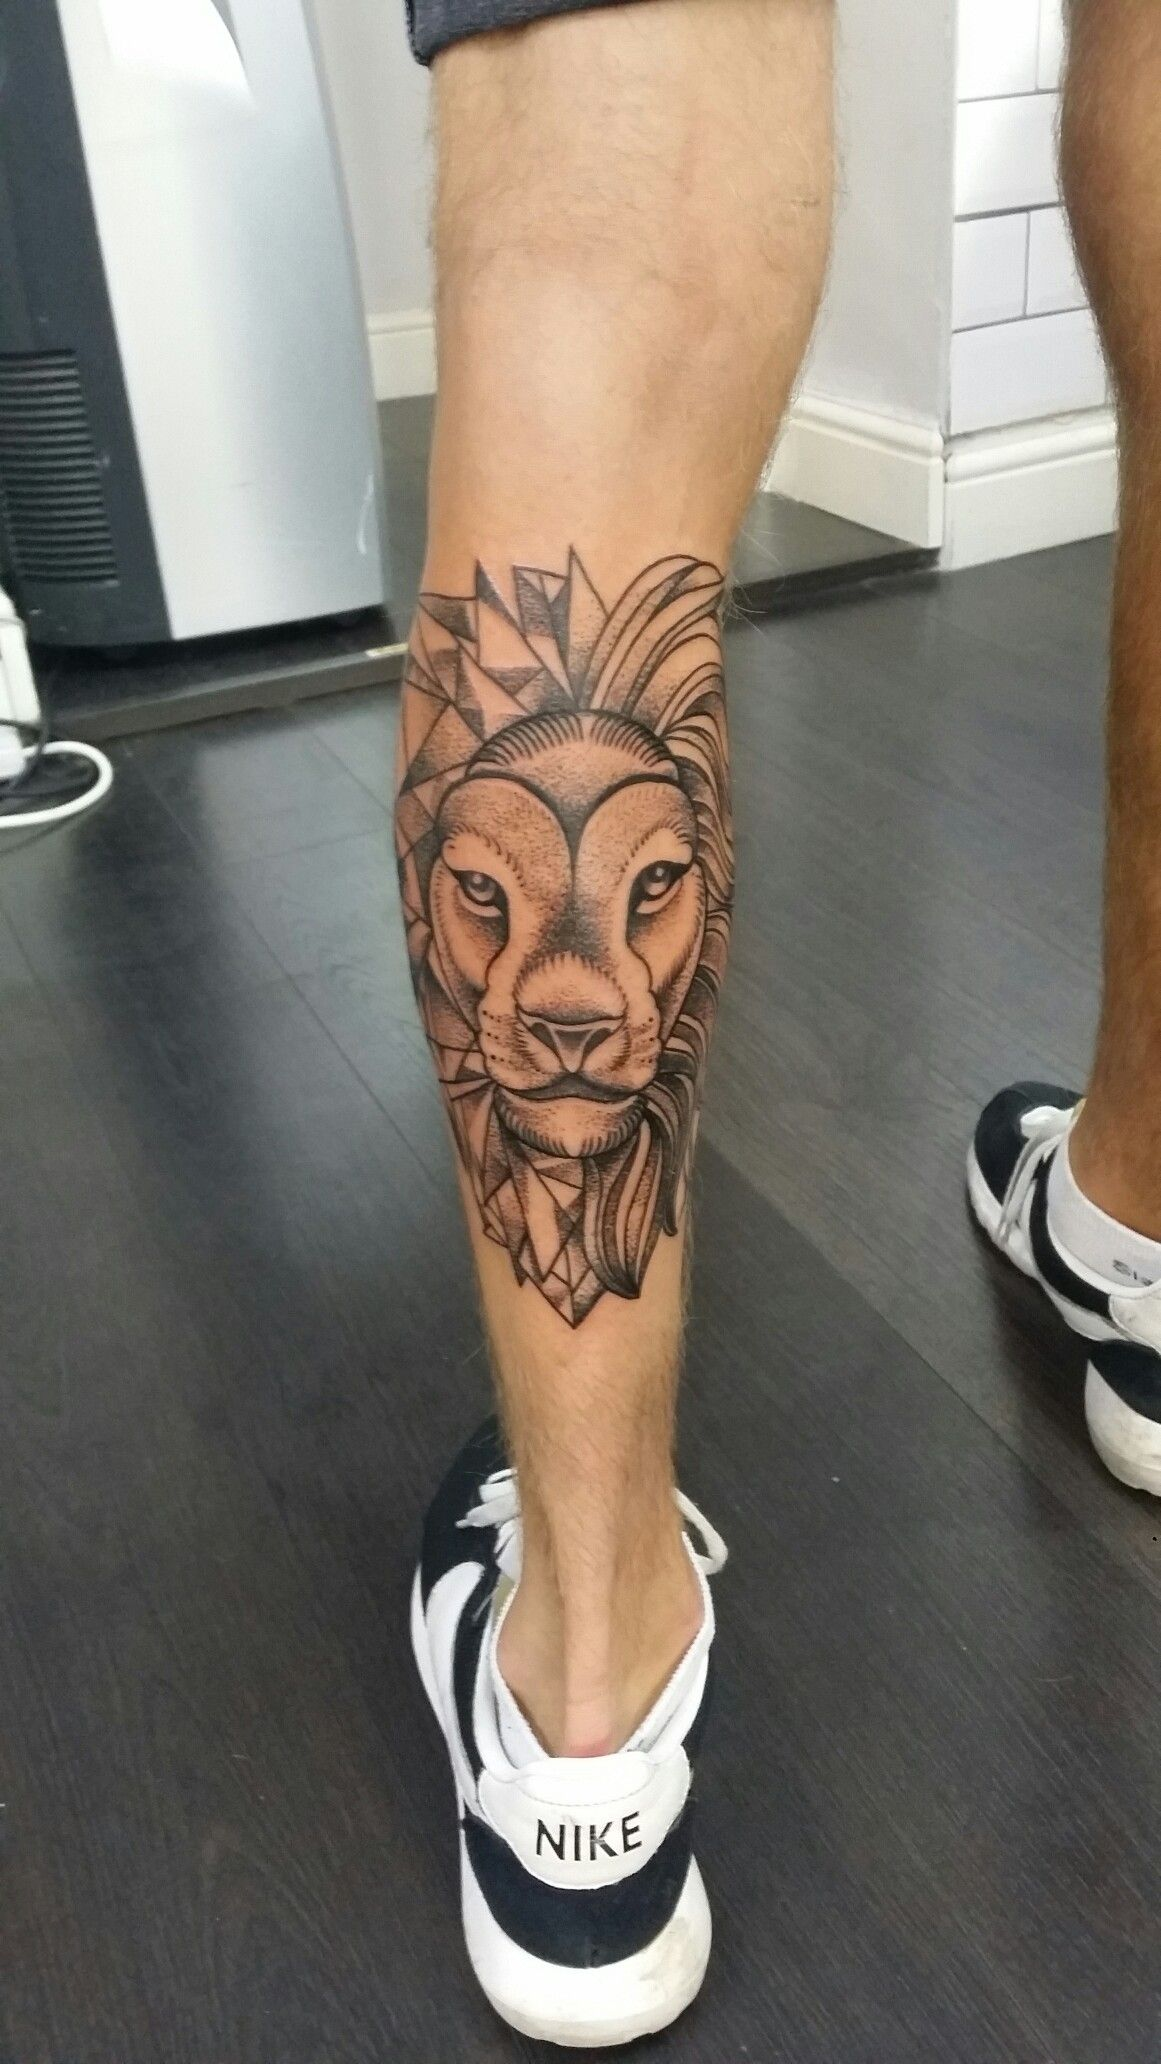 Pin by Michalis Meramveliotakis on Tattoo ideas Calf